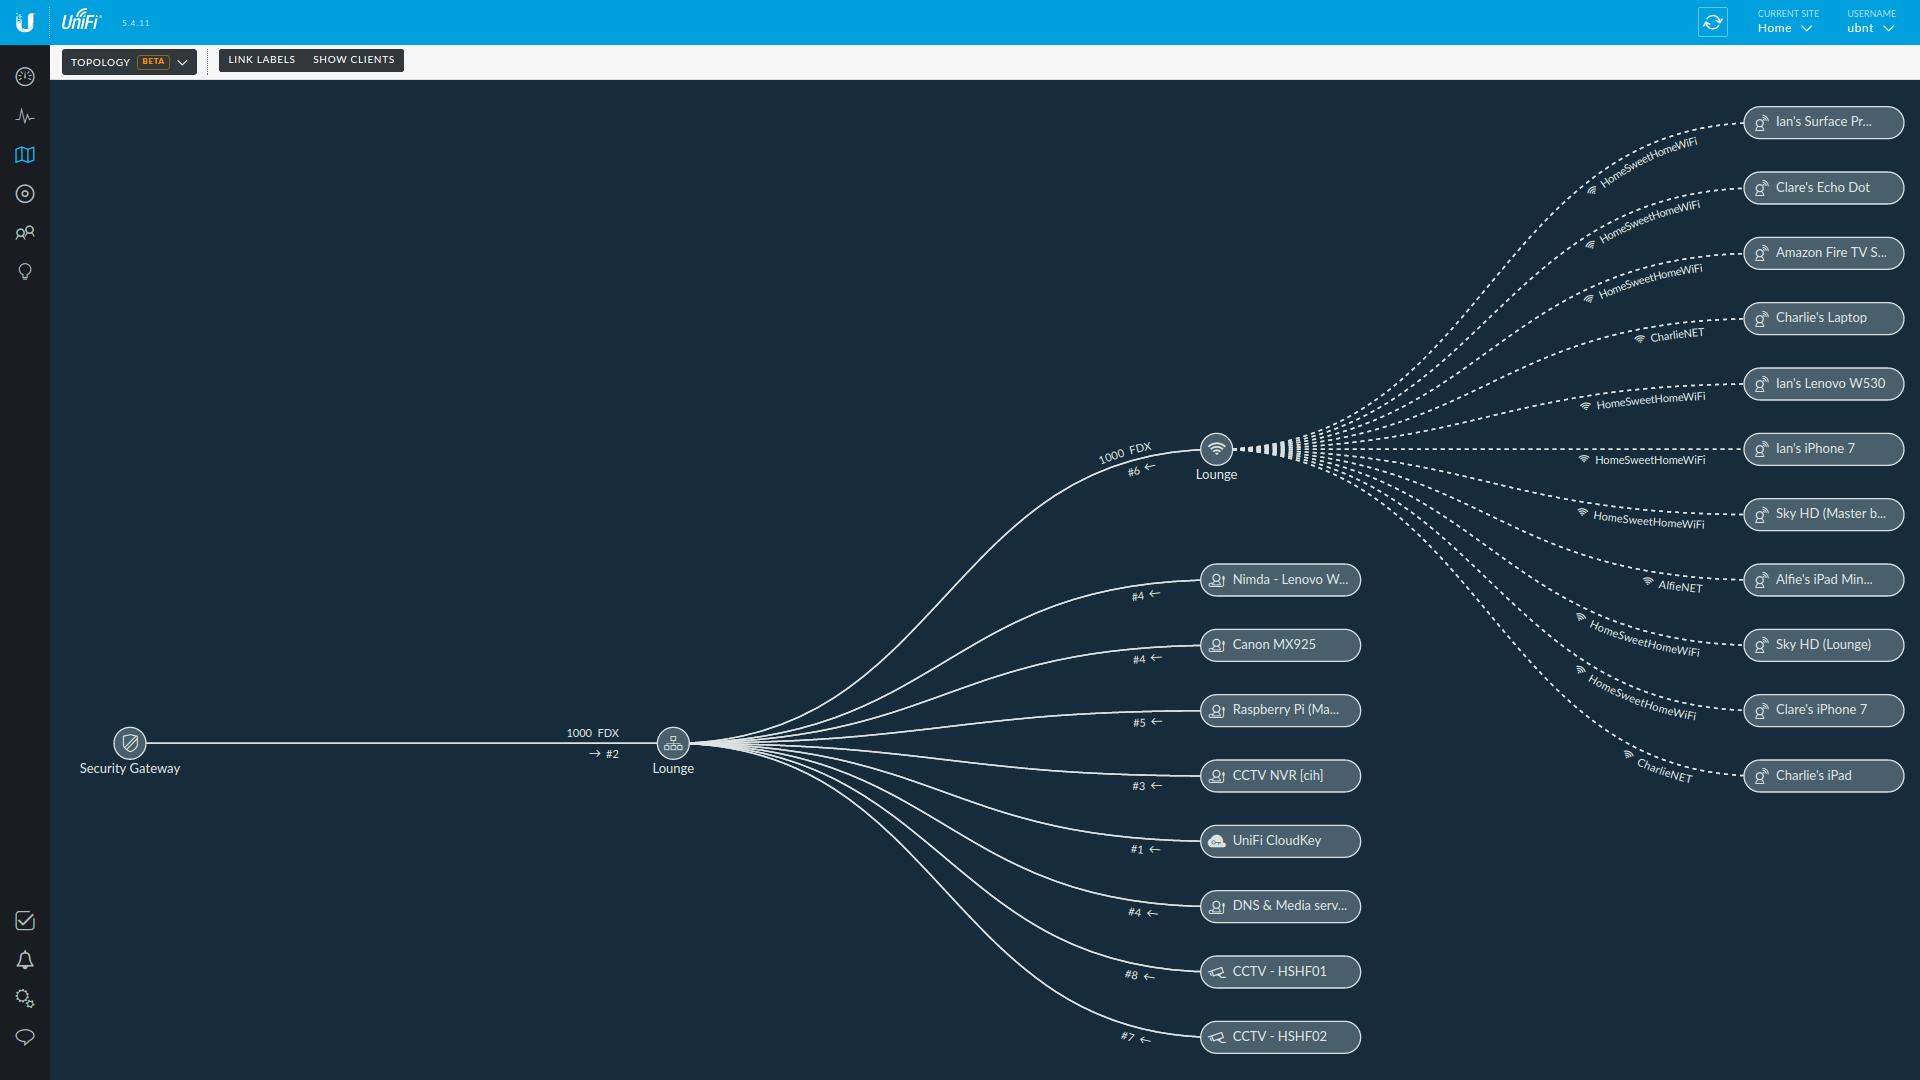 UniFi topology map